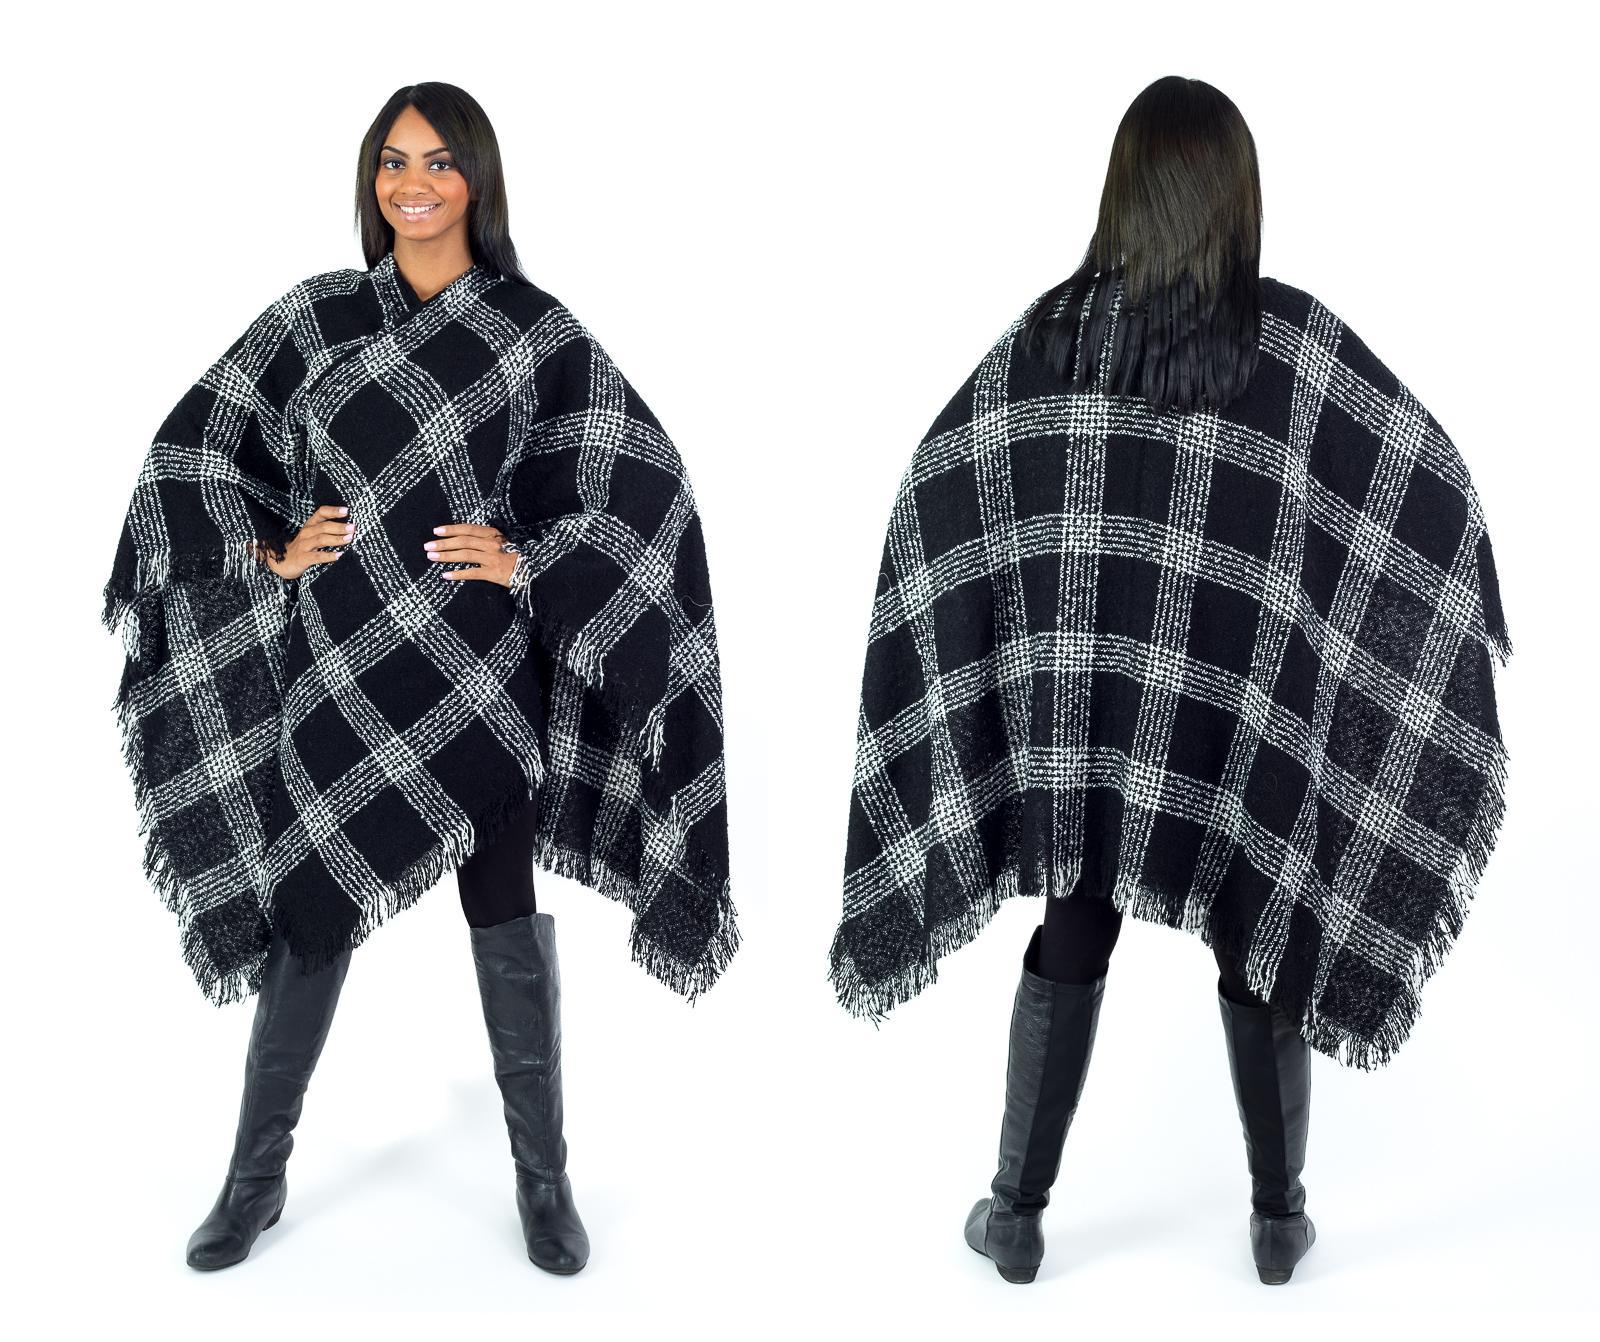 Women's Fall Winter Poncho Cape Shawl Wrap, Black